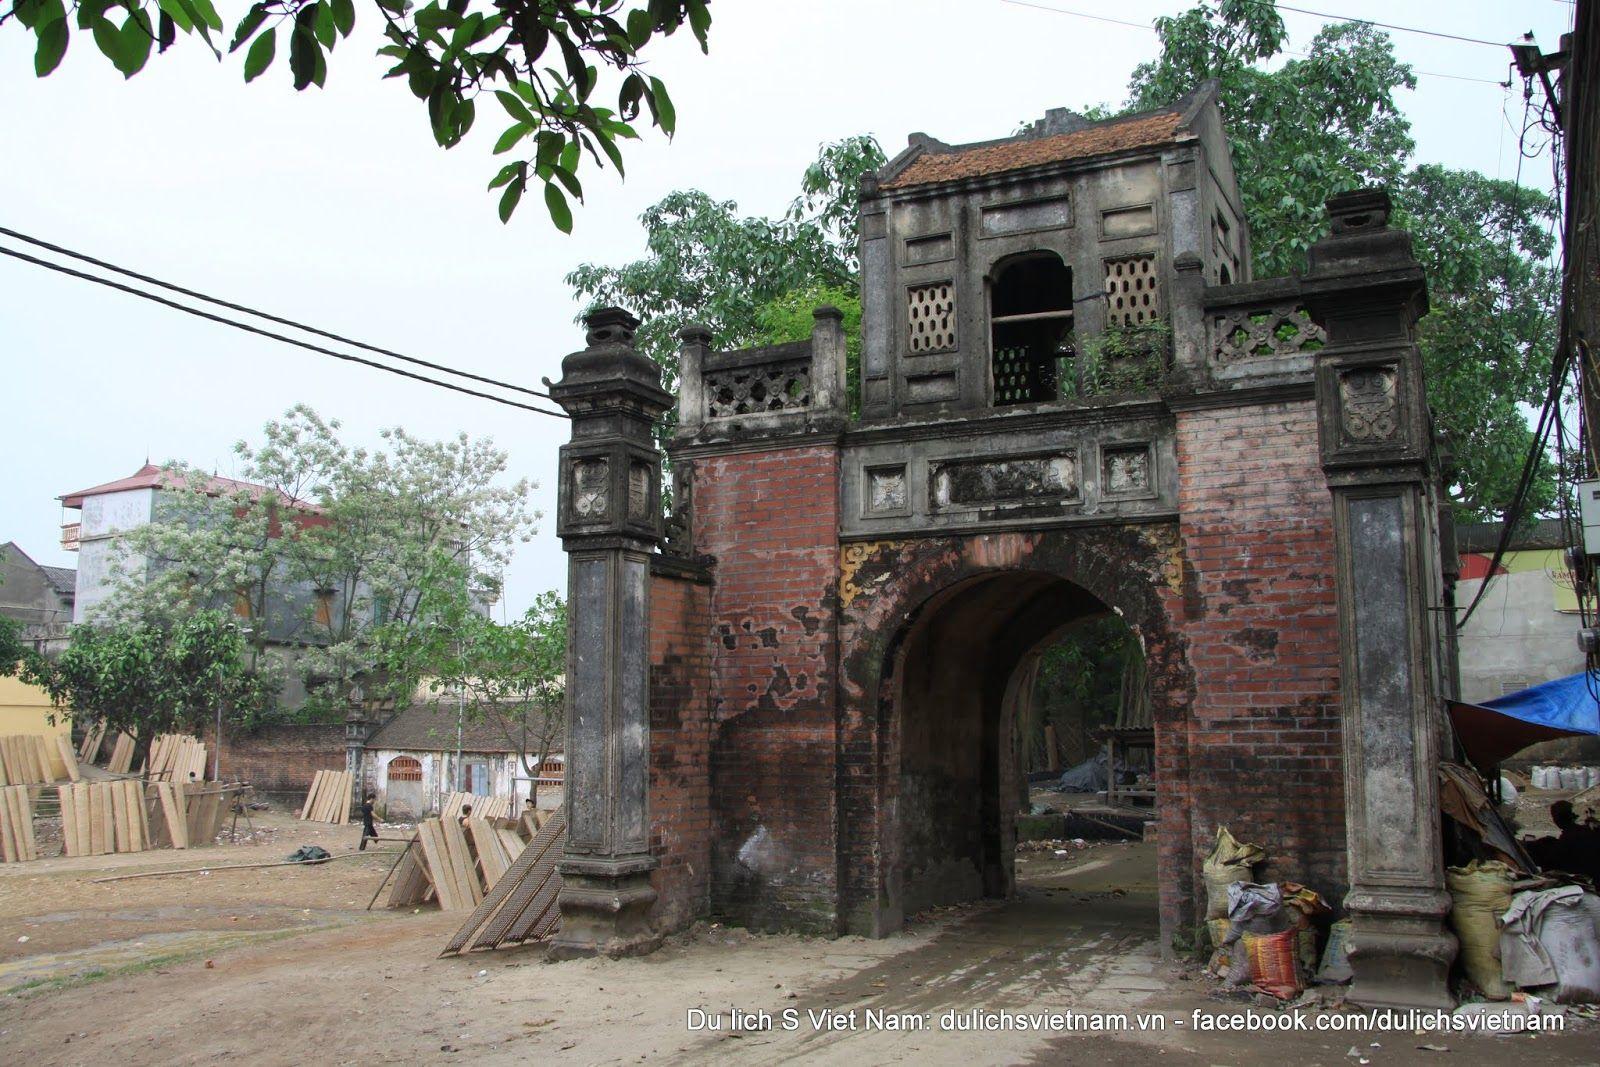 Discovery Vietnamese village, Village Gate, Vietnamese